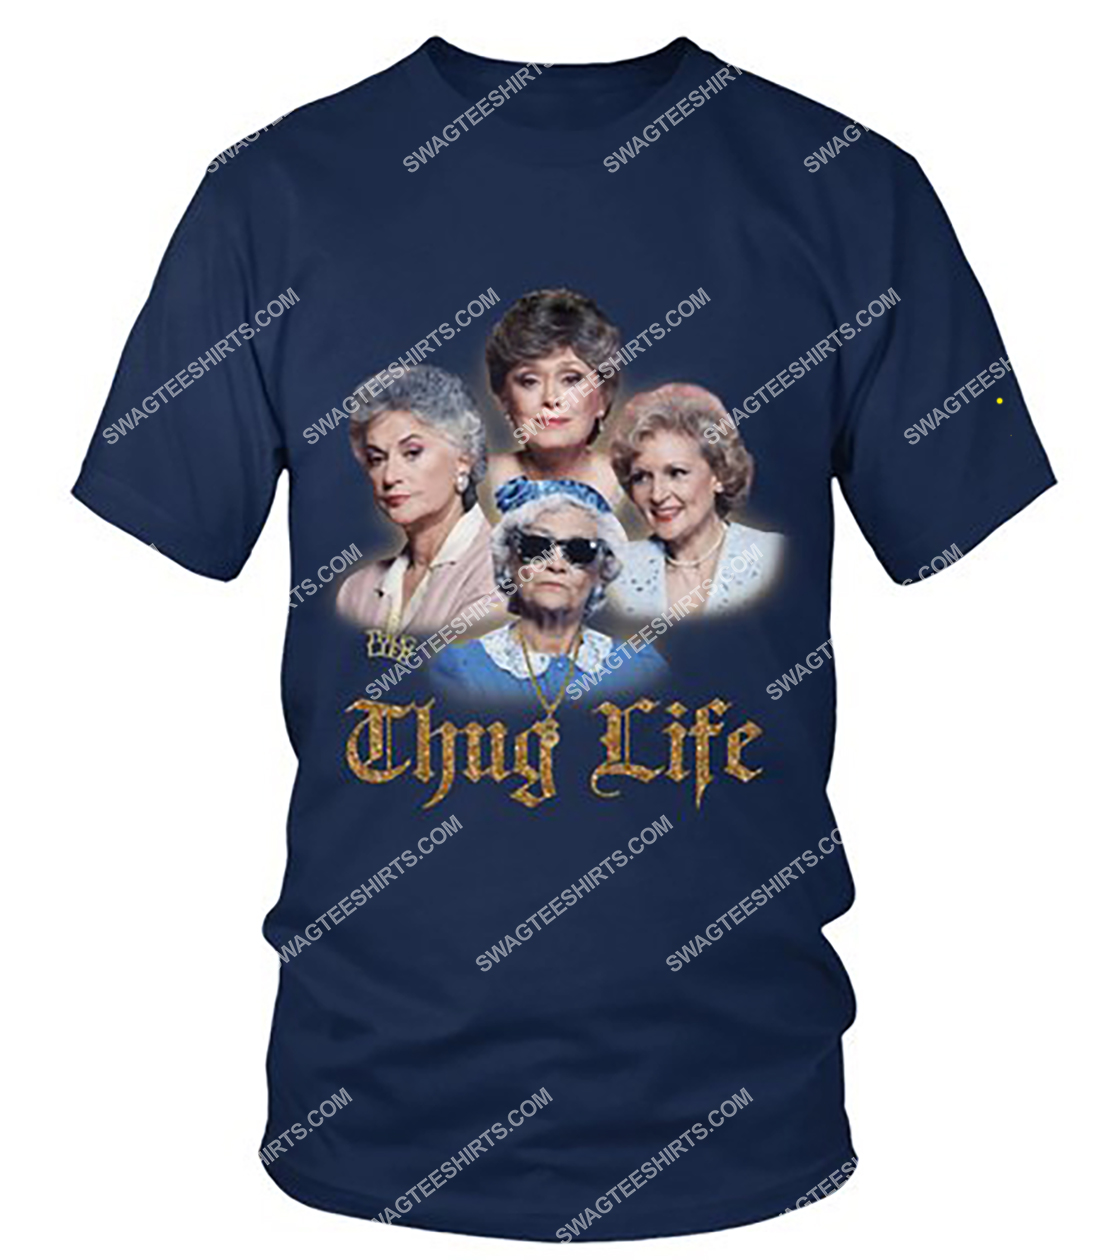 thug life the golden girls movie shirt 2(1)